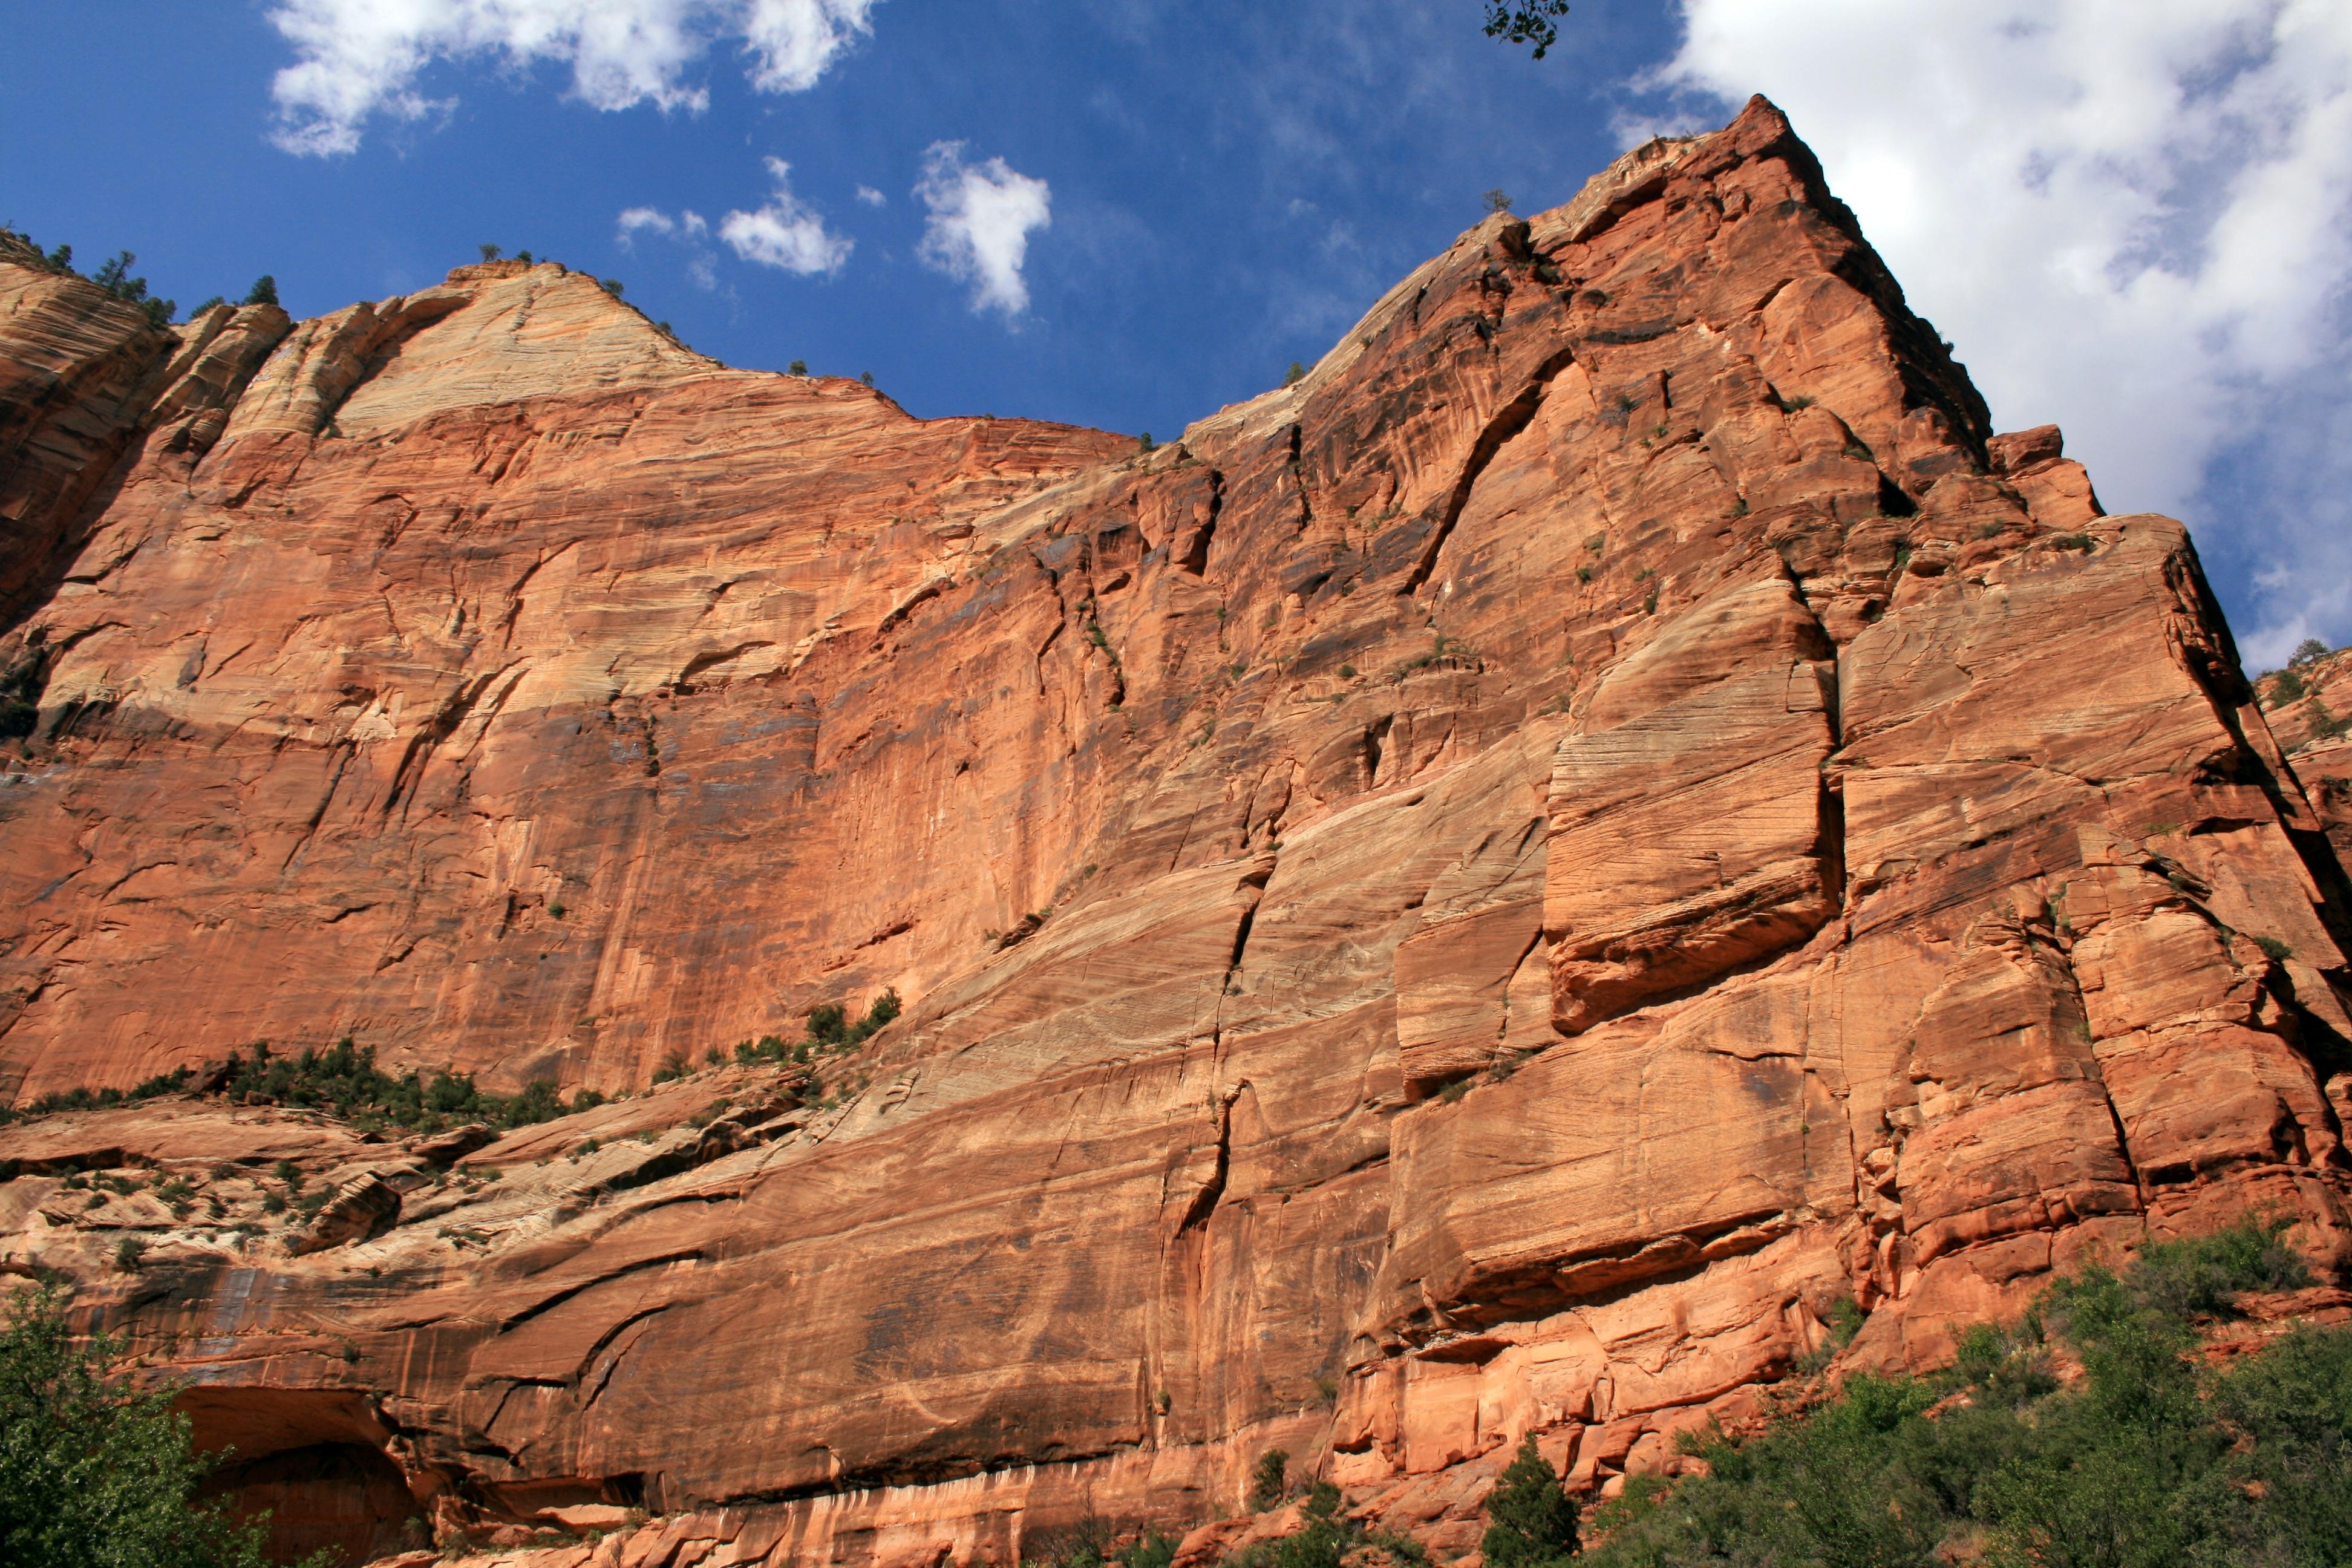 Zion cliffs stands out